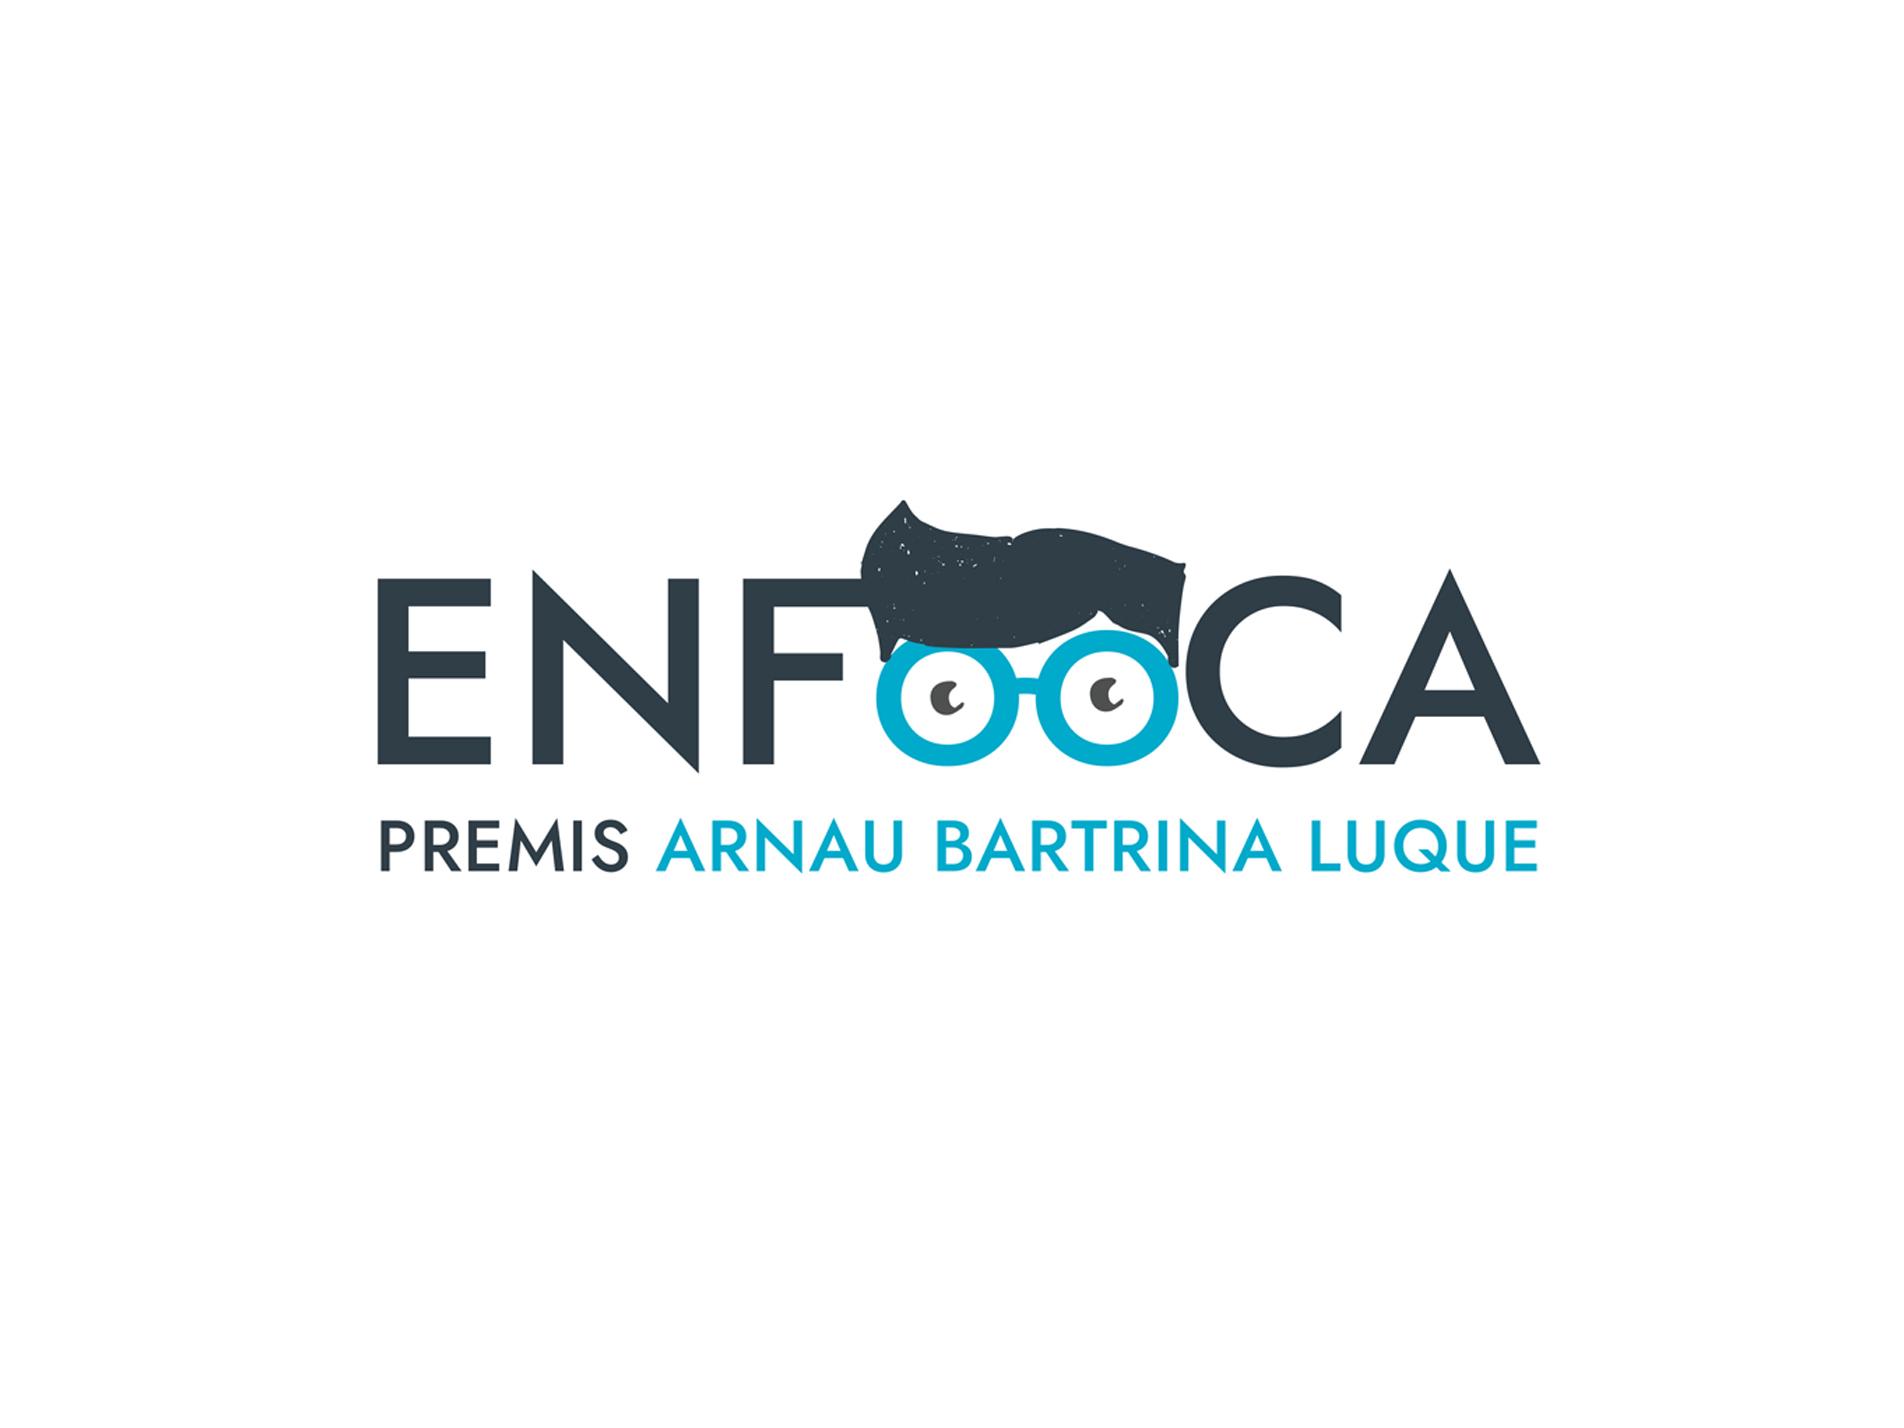 Projecte ENFooCA, Premis Arnau Bartrina Luque